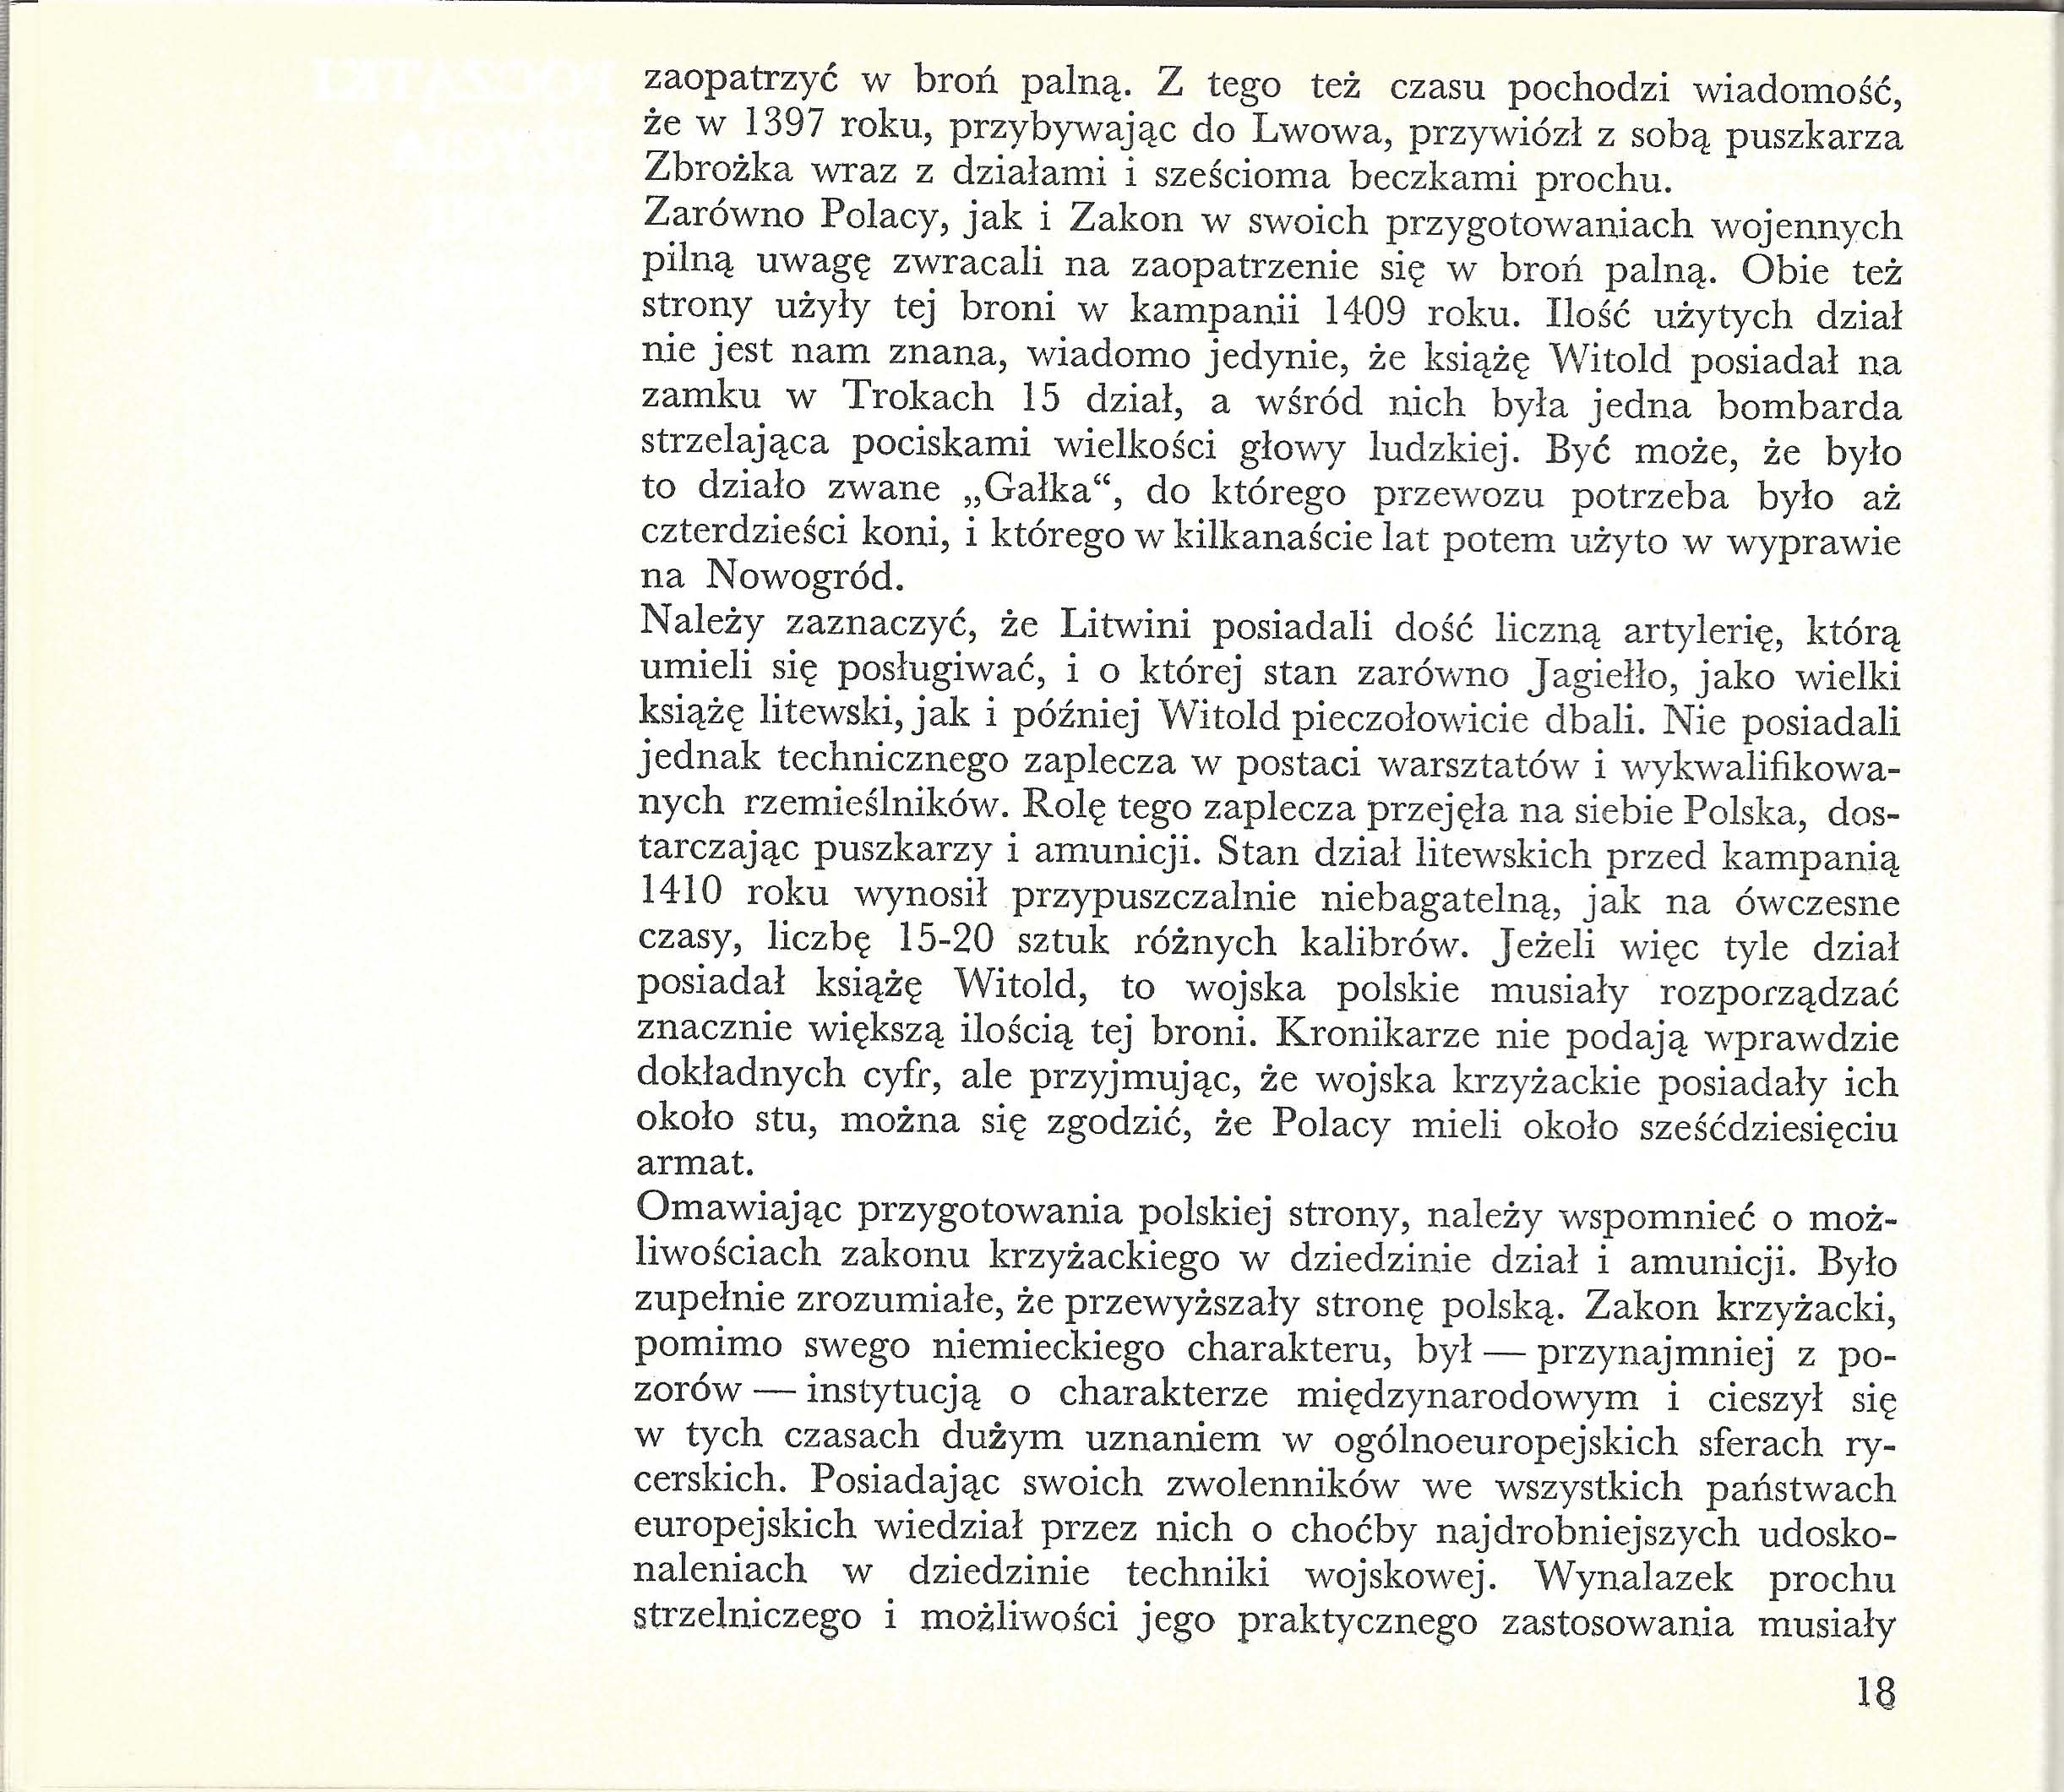 polska.bron.palna.kobielski15-23_Strona_2